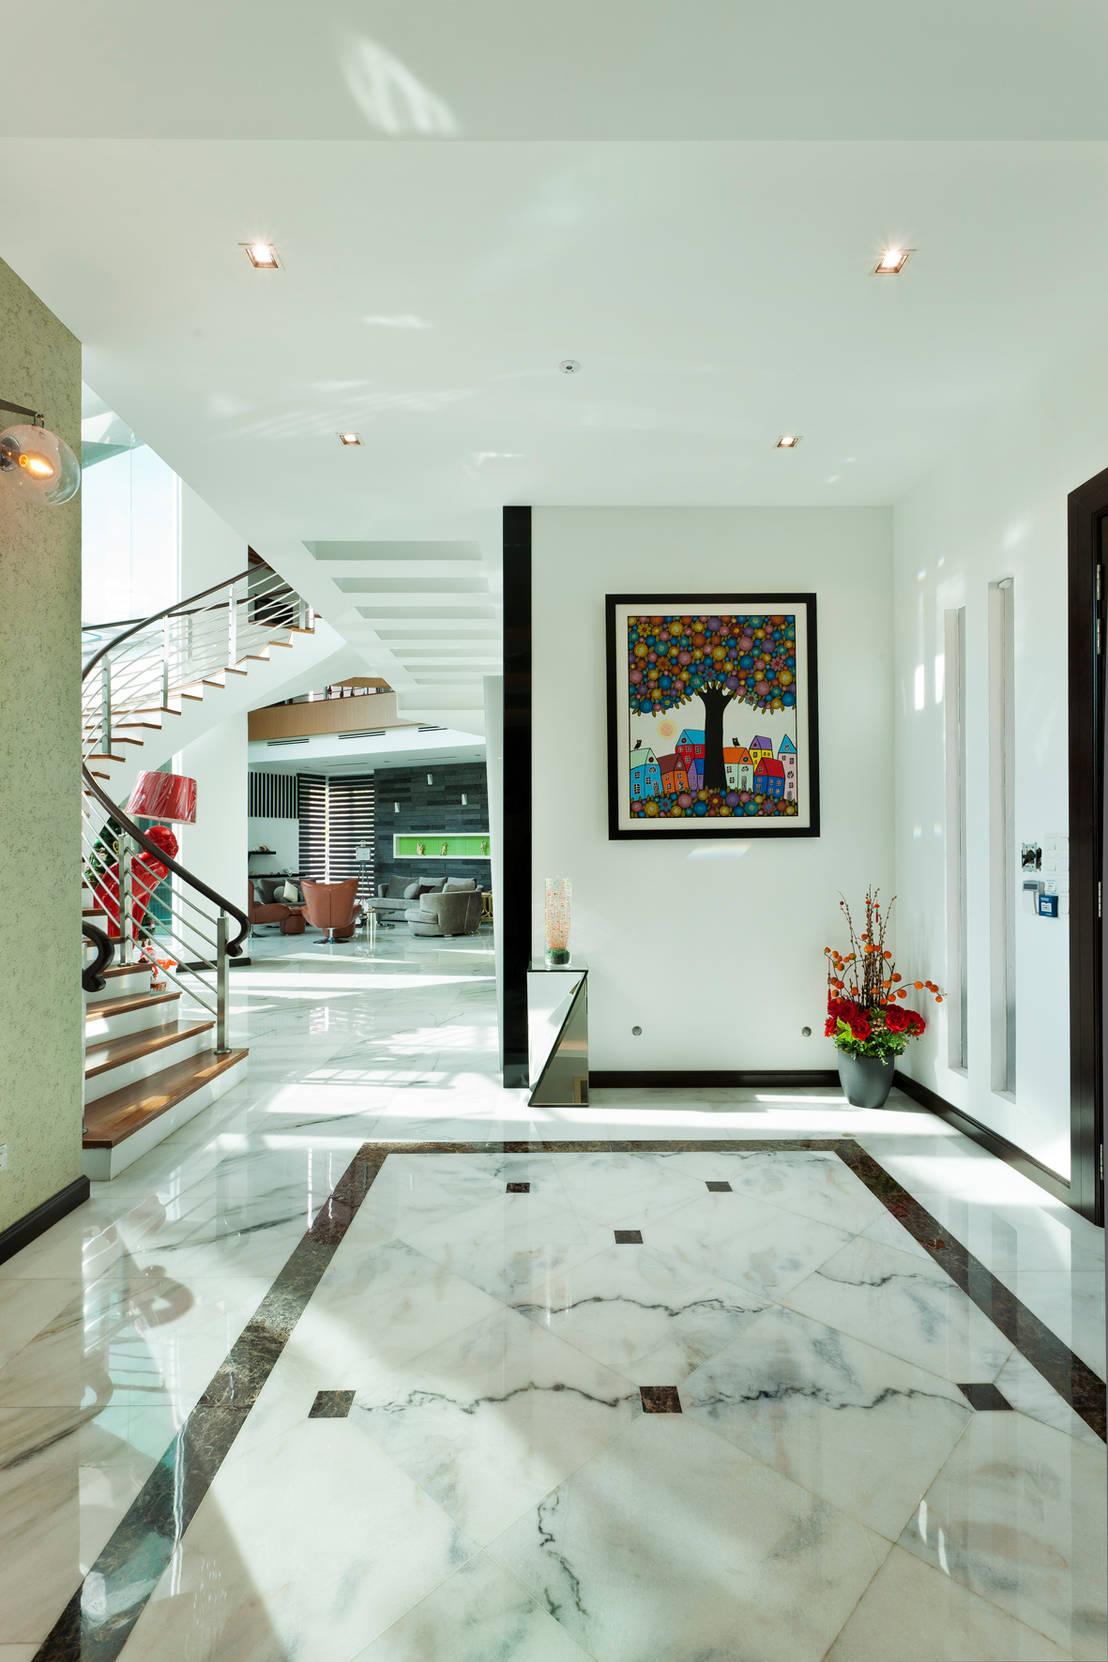 Contemporarily dashing bungalow di design spirits homify for Concetto di design moderno bungalow